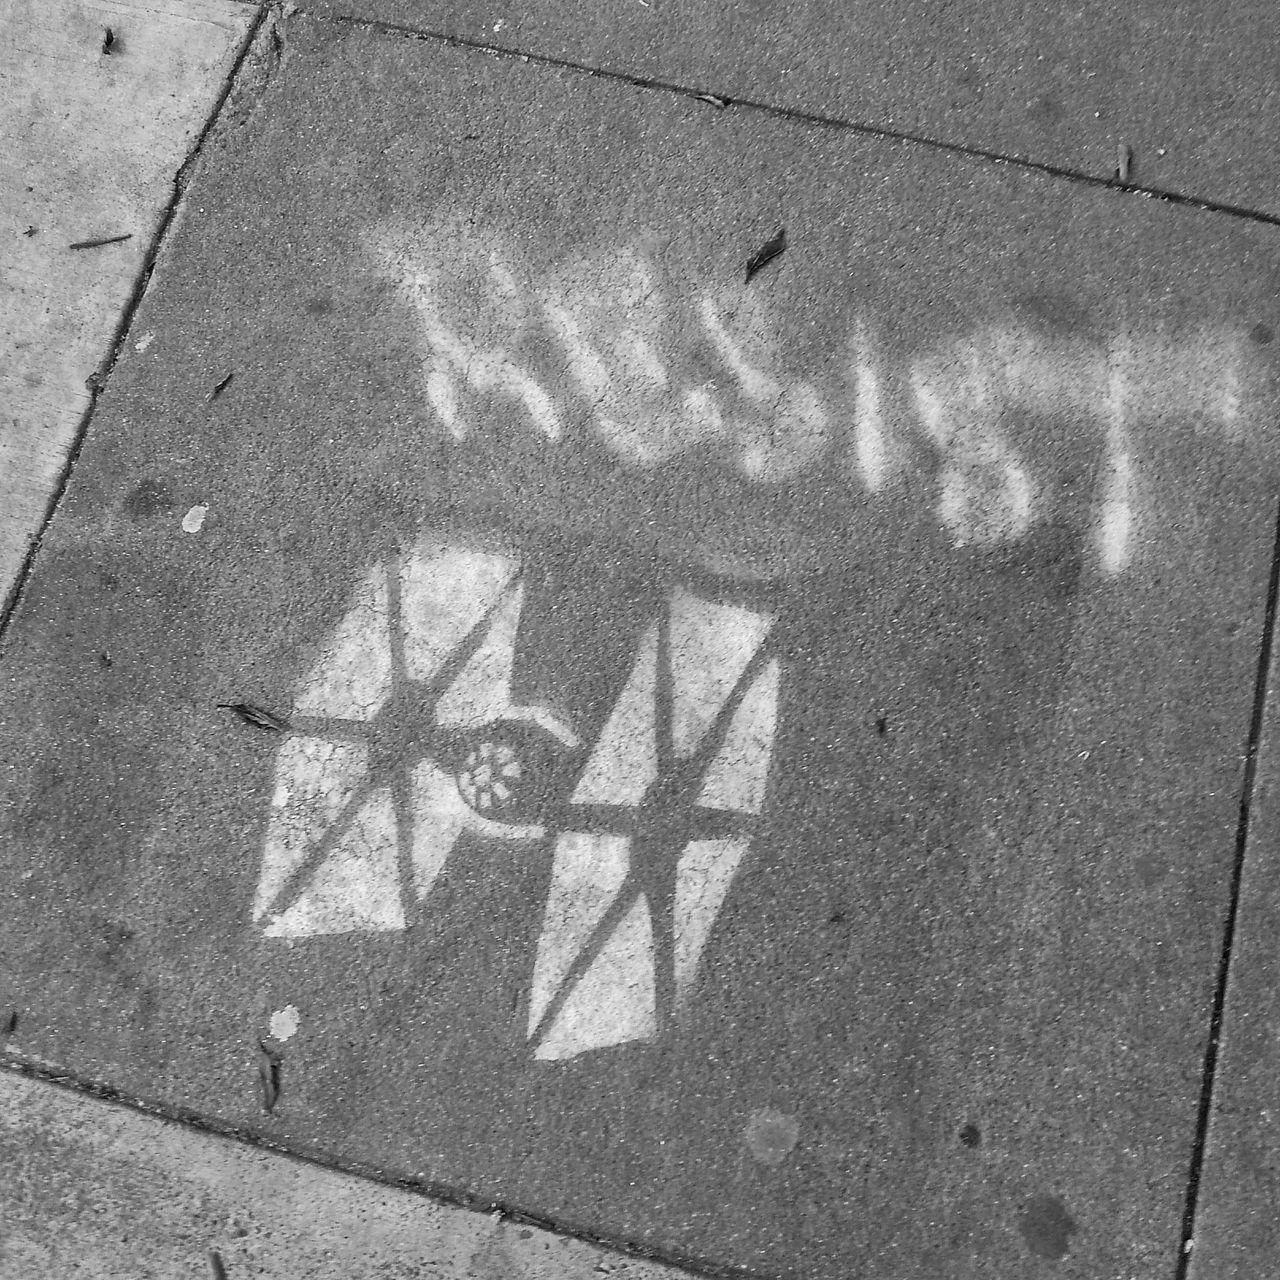 California Day Daylight Exterior Graffiti Mobilephotography No People Outdoors Outside Resist Samsung Galaxy S III San Francisco Sidewalk Star Wars Stencil Art